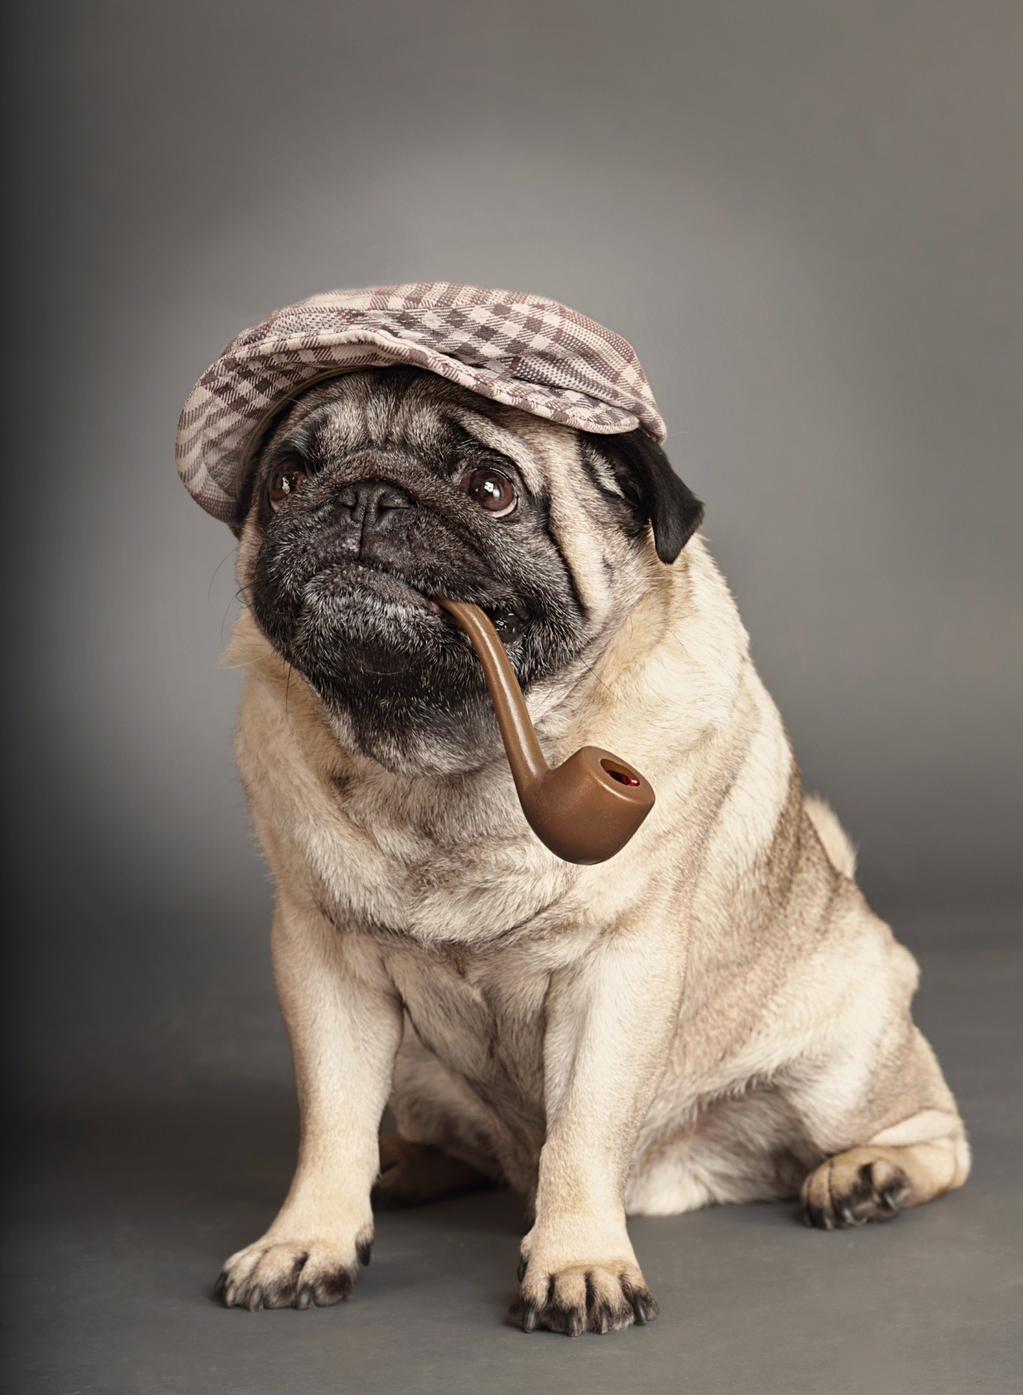 Pug Time On Brachycephalic Pinterest Pugs Dogs And Pets